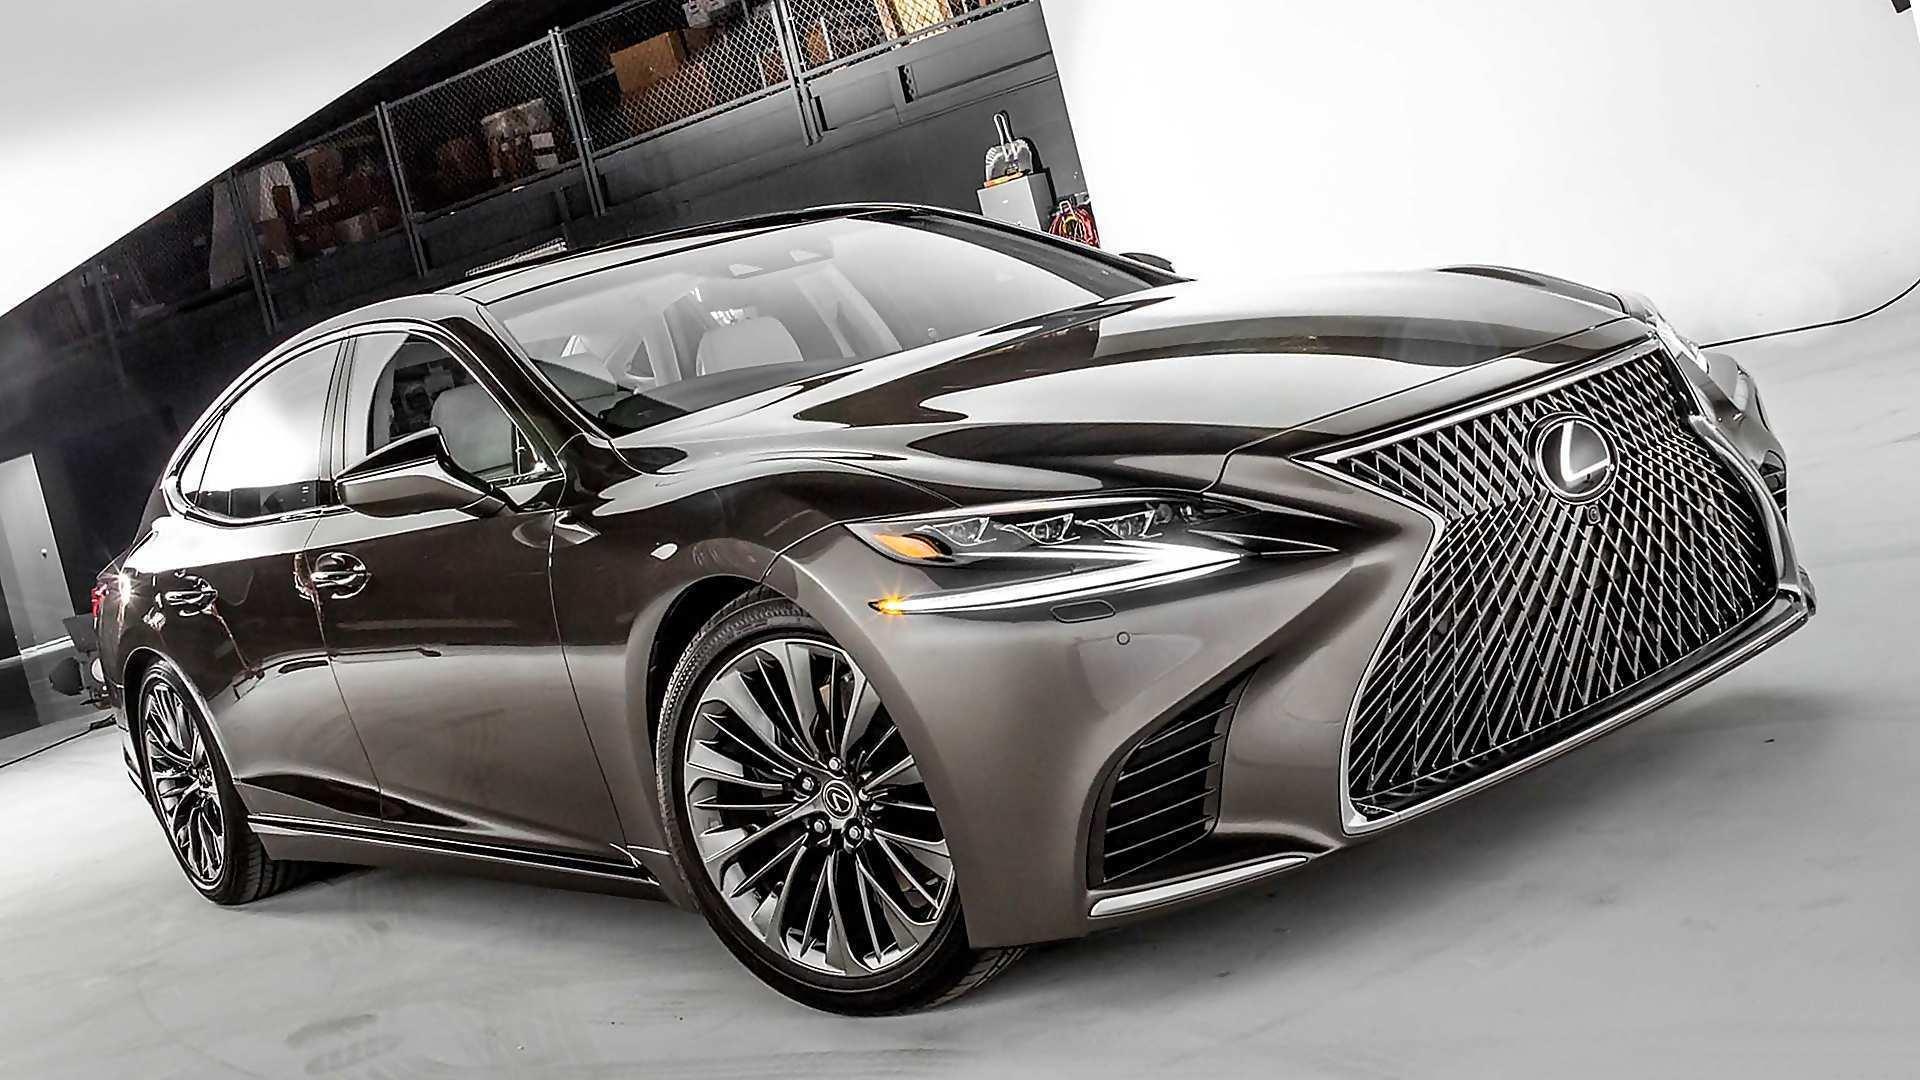 21 Great 2019 Lexus Ls Price Picture by 2019 Lexus Ls Price